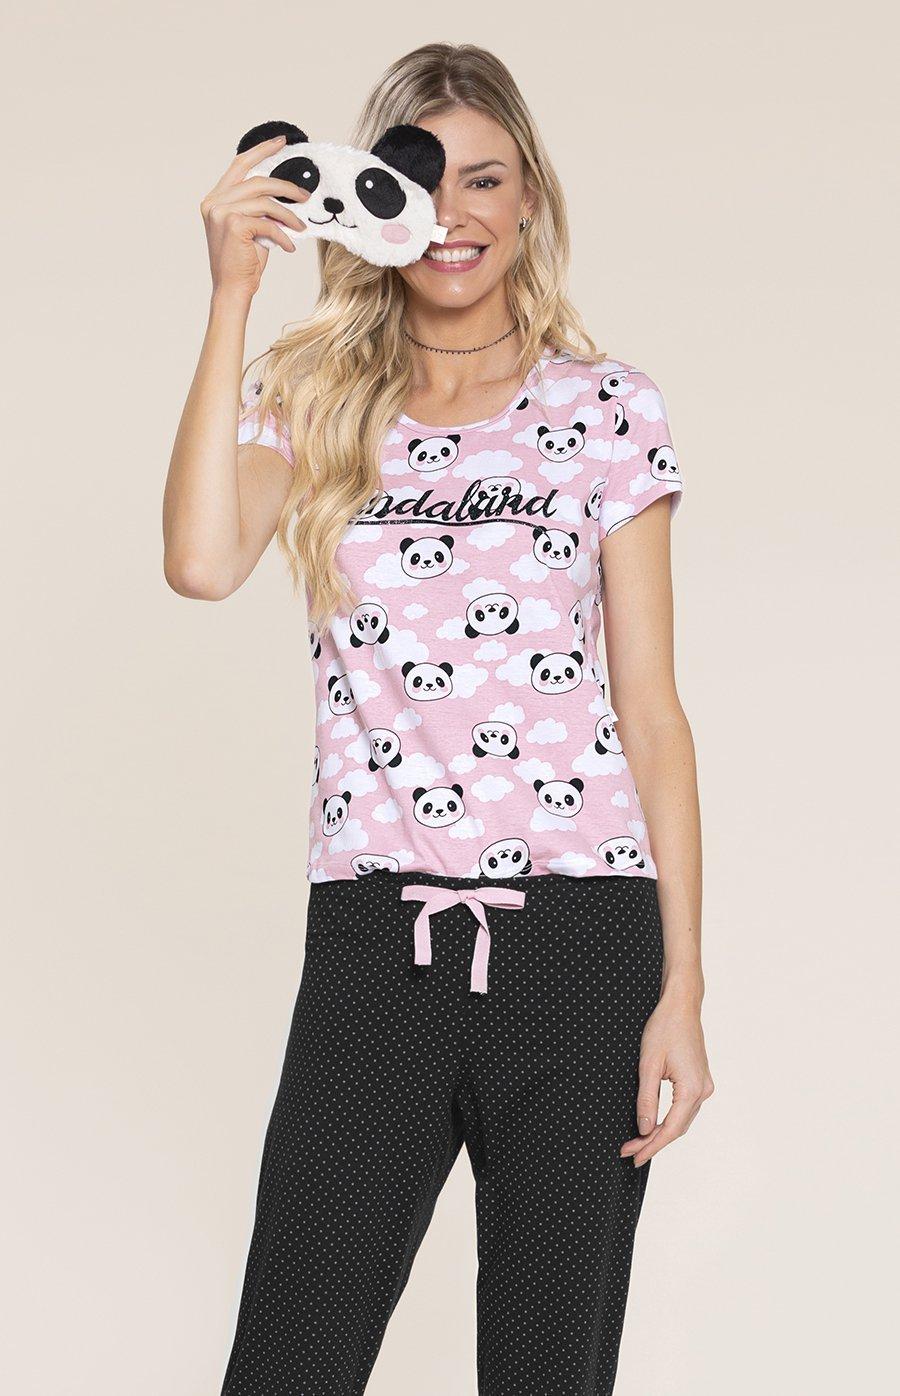 Pijama Teen 100% Algodão Fun Inverno 2020 SWEET STORIES